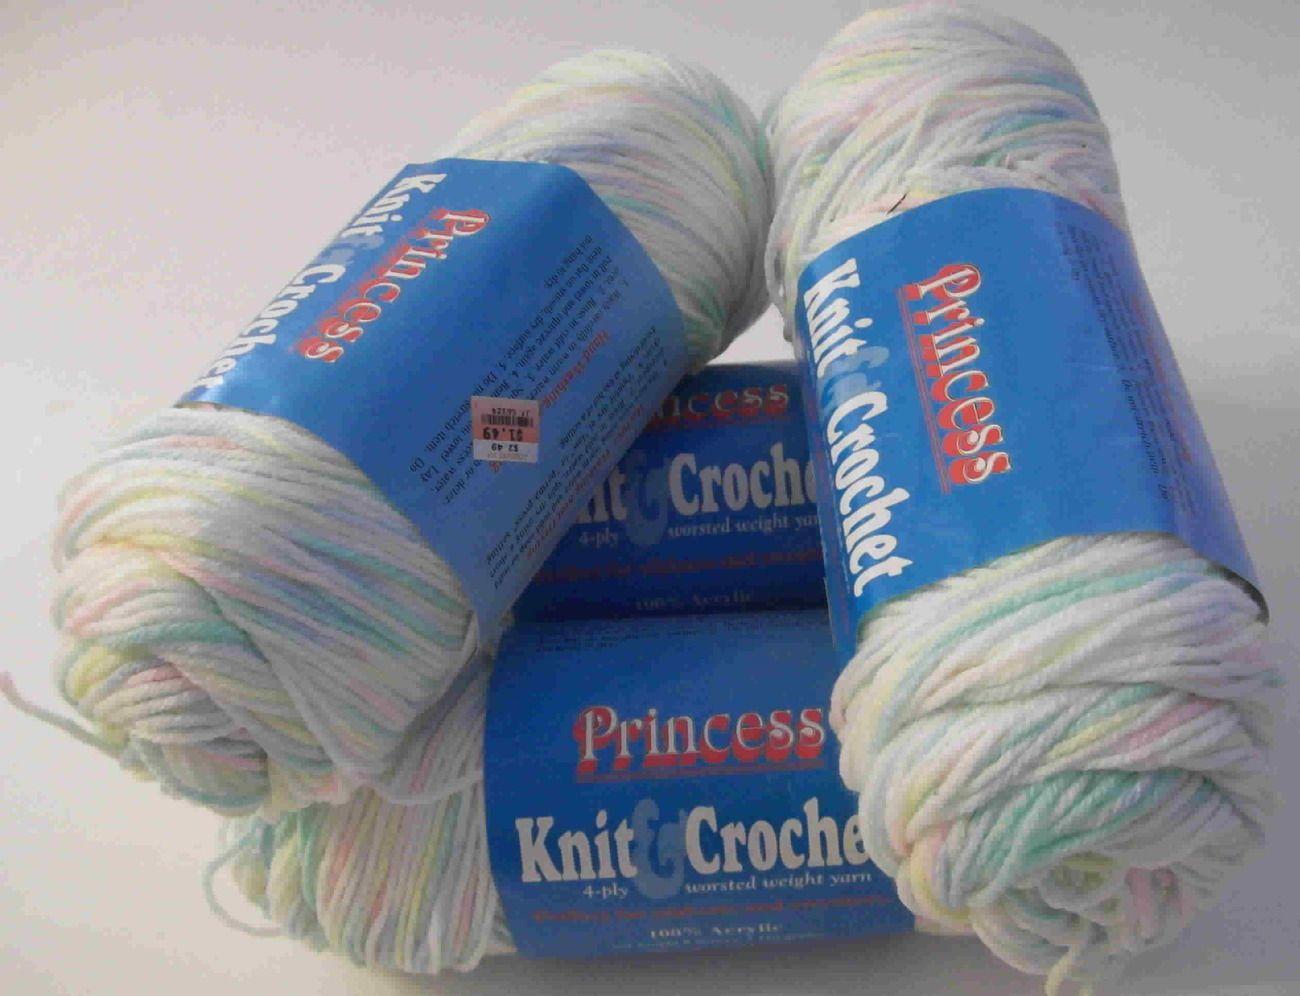 Coats and Clark Princess Knit and Crochet Yarn Nursery Rhymes